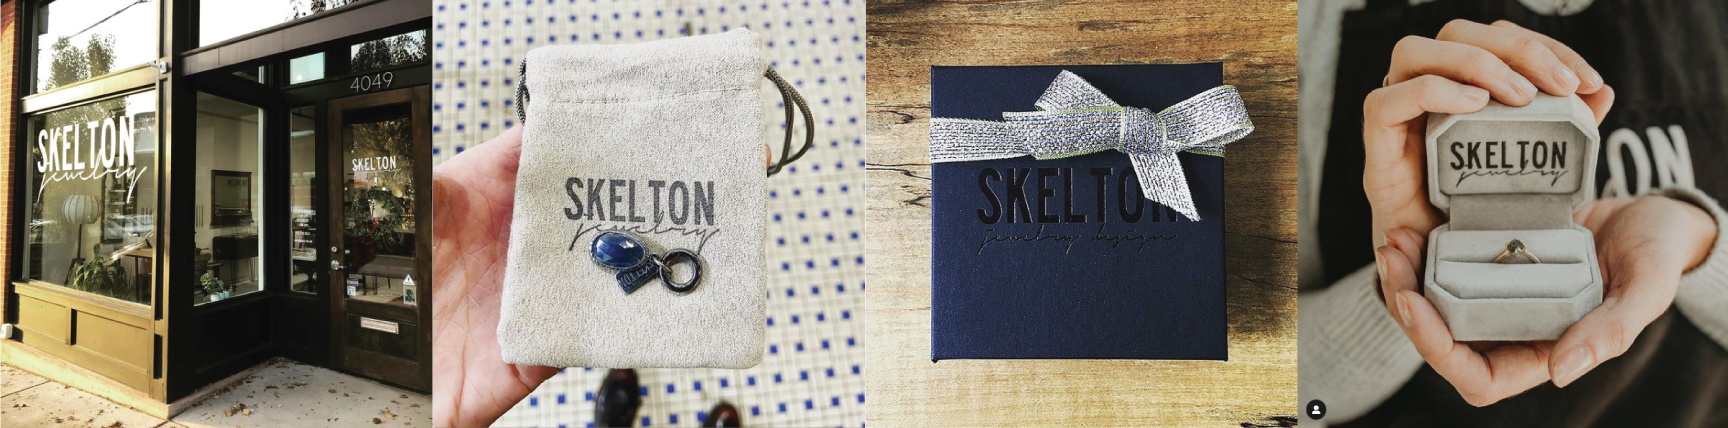 Samantha Skelton Jewelry branding